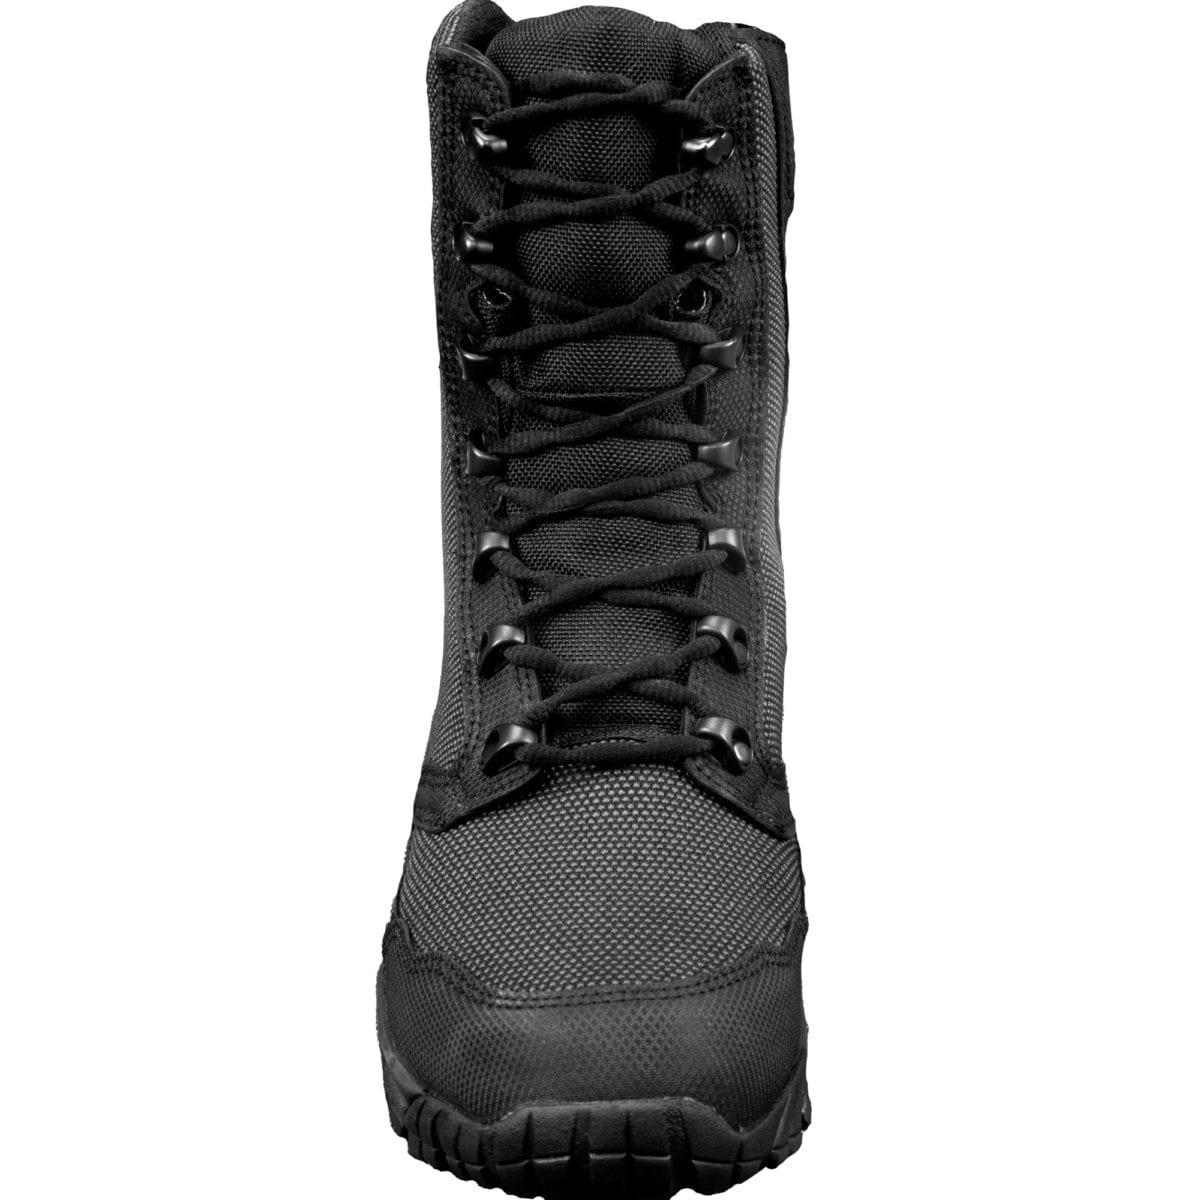 8214a17387cd07 ALTAI™ 8″ Waterproof Side Zip Black Tactical Boots Model  MFT200-Z